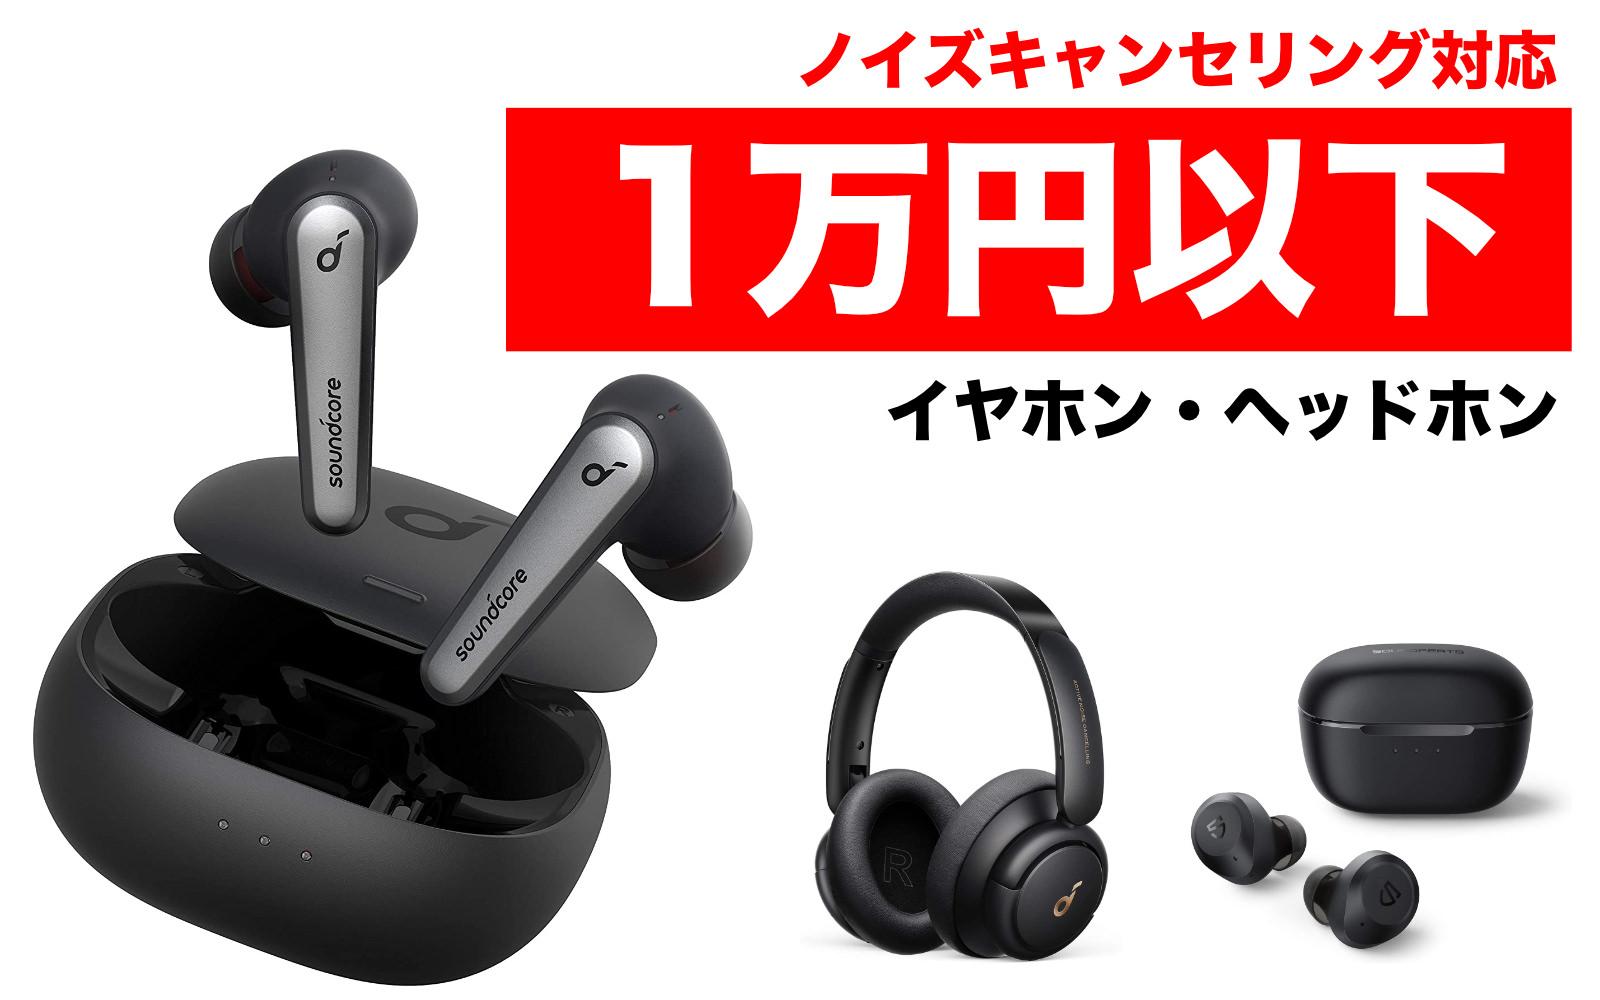 Noise Cancelling Earphones and Headphones